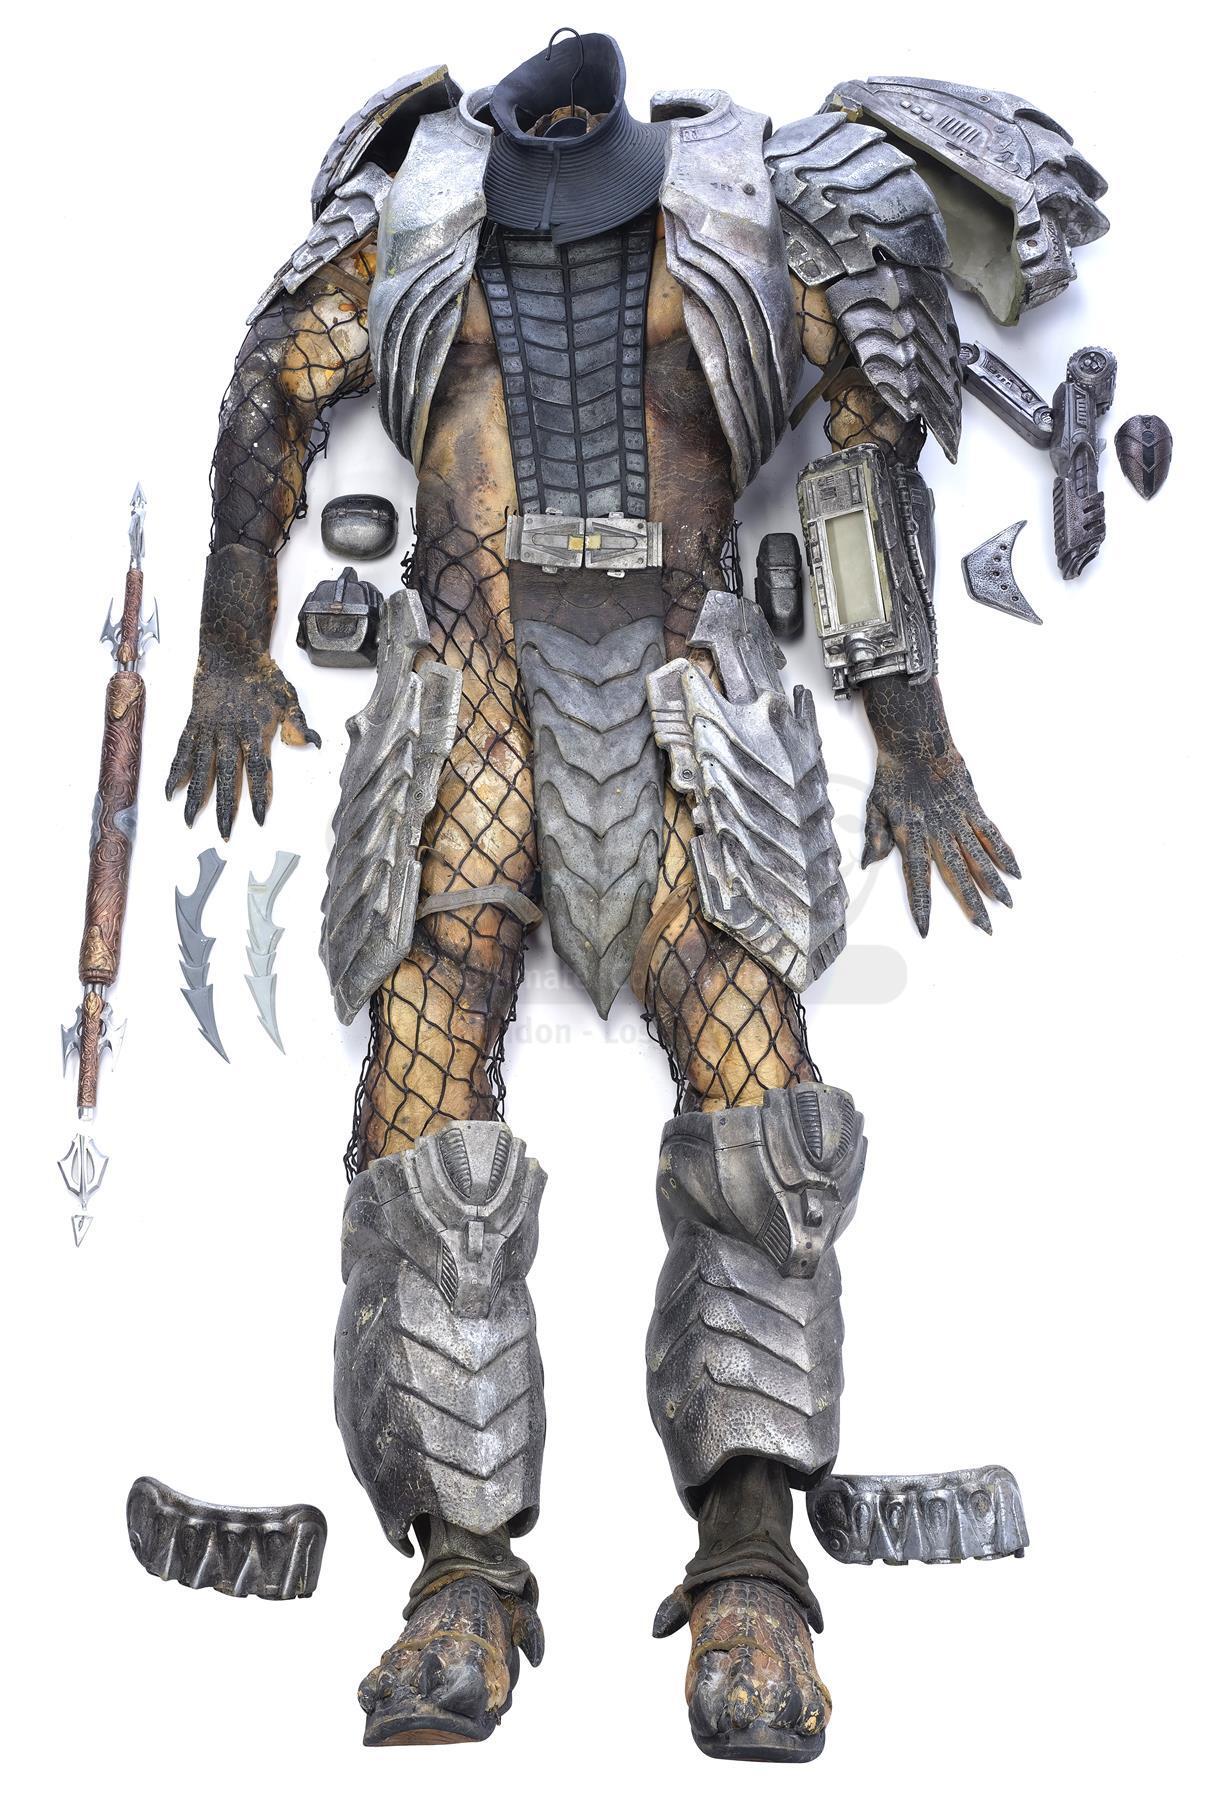 Lot # 18: AVP: ALIEN VS. PREDATOR - Scar (Ian Whyte) Predator Costume